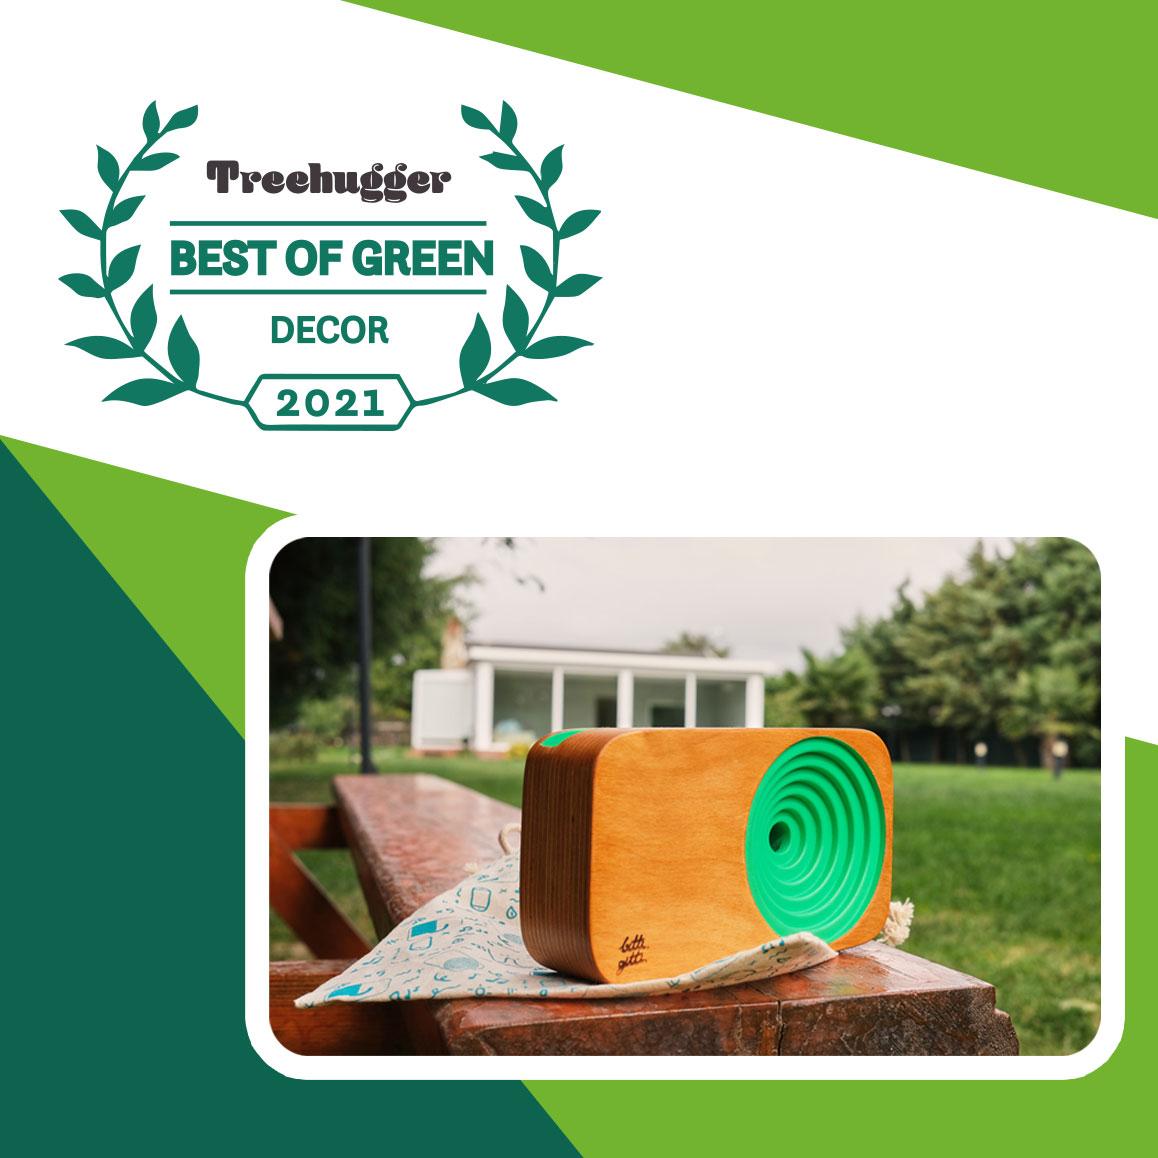 Ahşap Ses Sistemi Best of Green Awards 2021 'i kazandı.